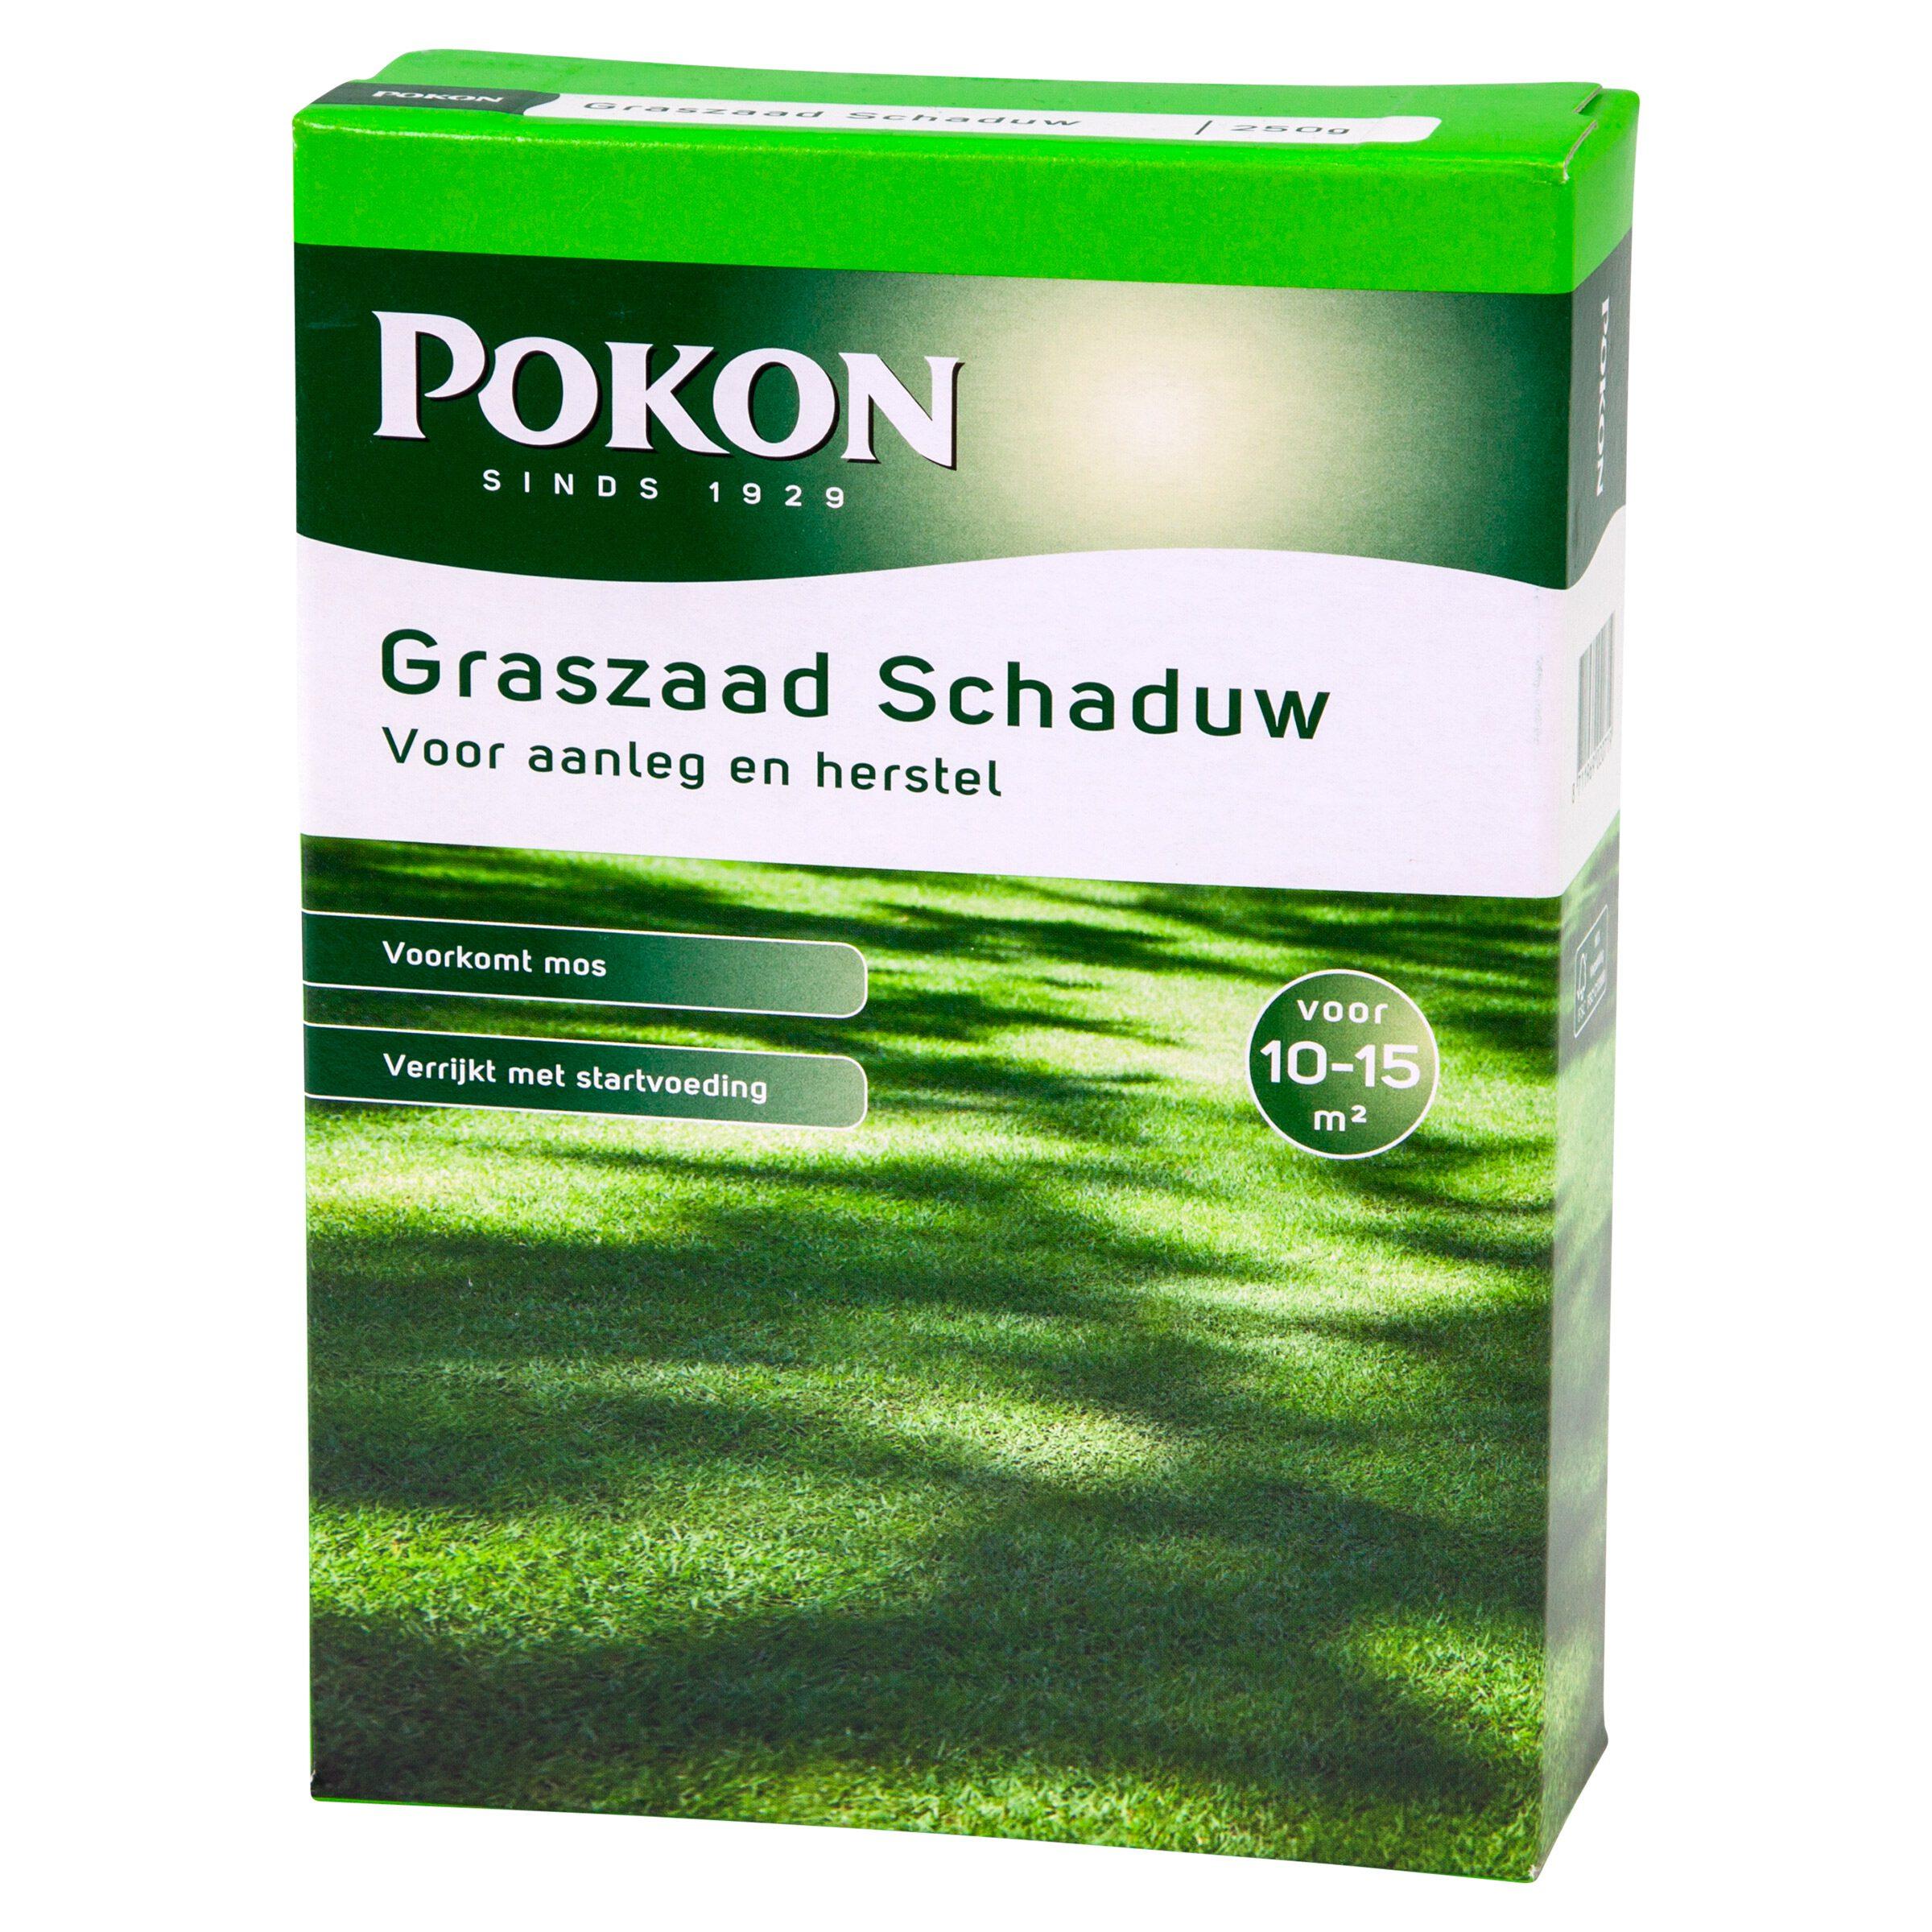 Pokon Graszaad Schaduw 500gr - cover